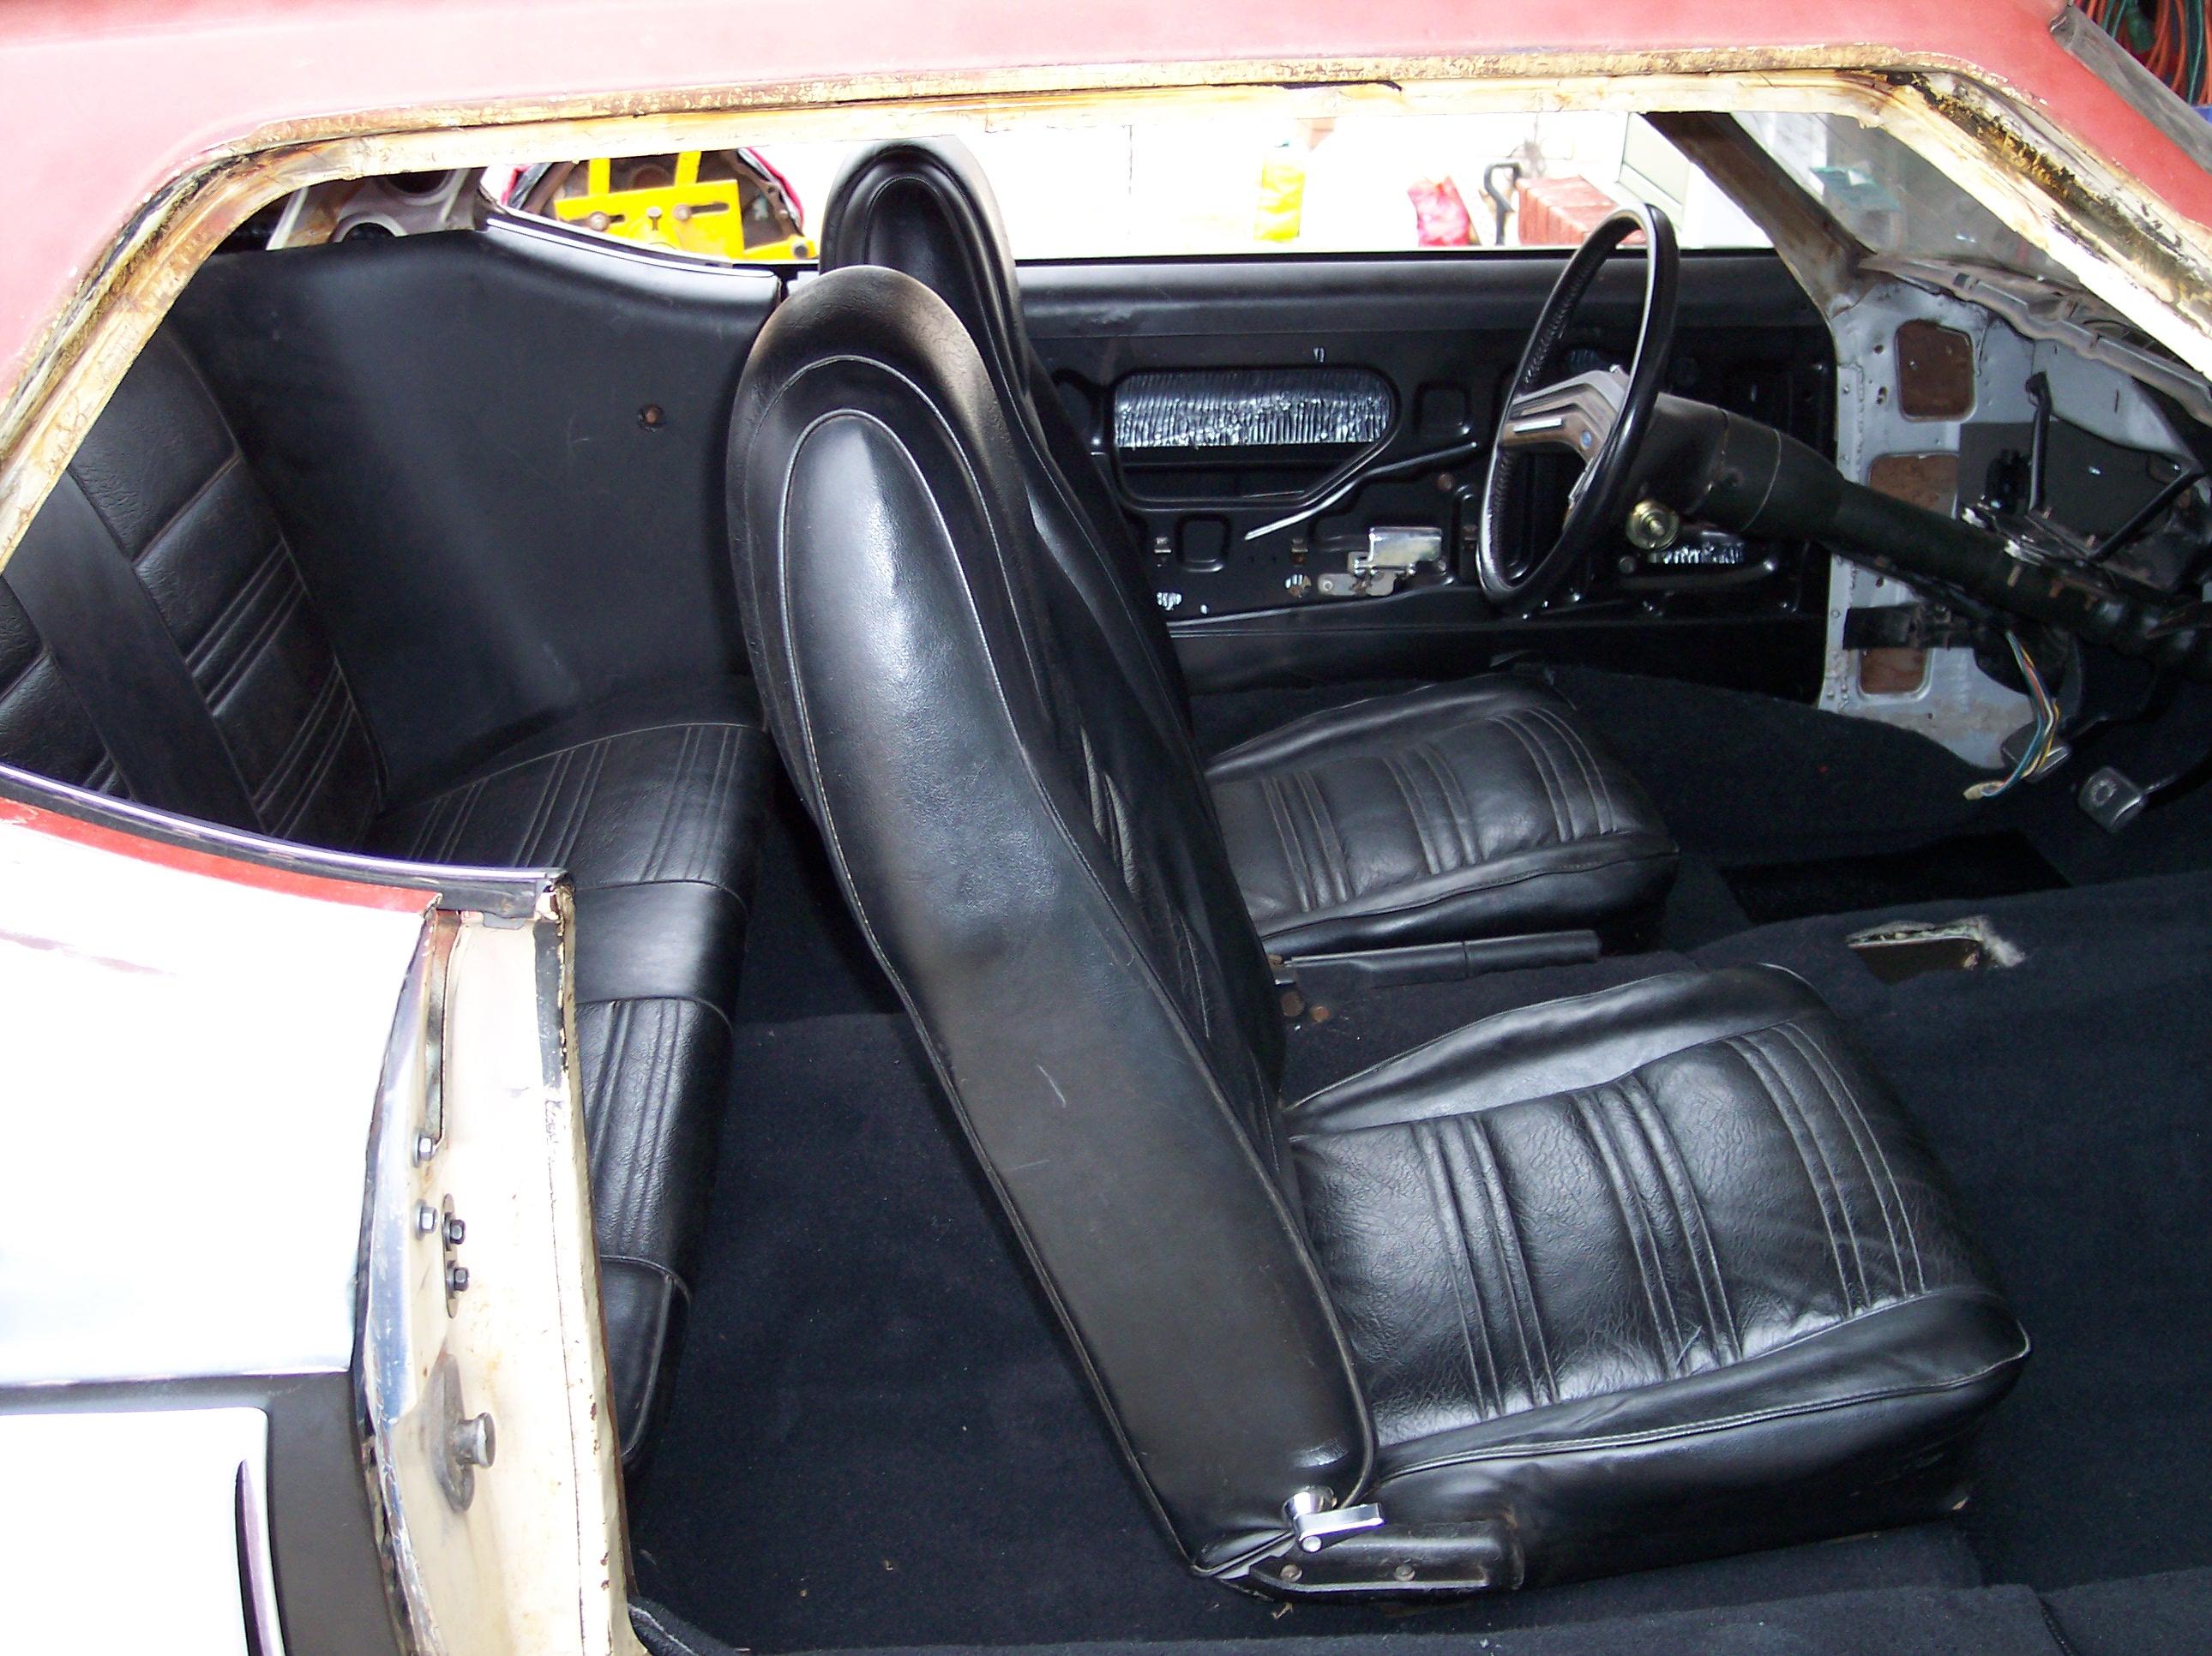 Ford Capri Mk1 69 74 Tailored Car Mats Black Vehicle Parts Accessories Car Parts